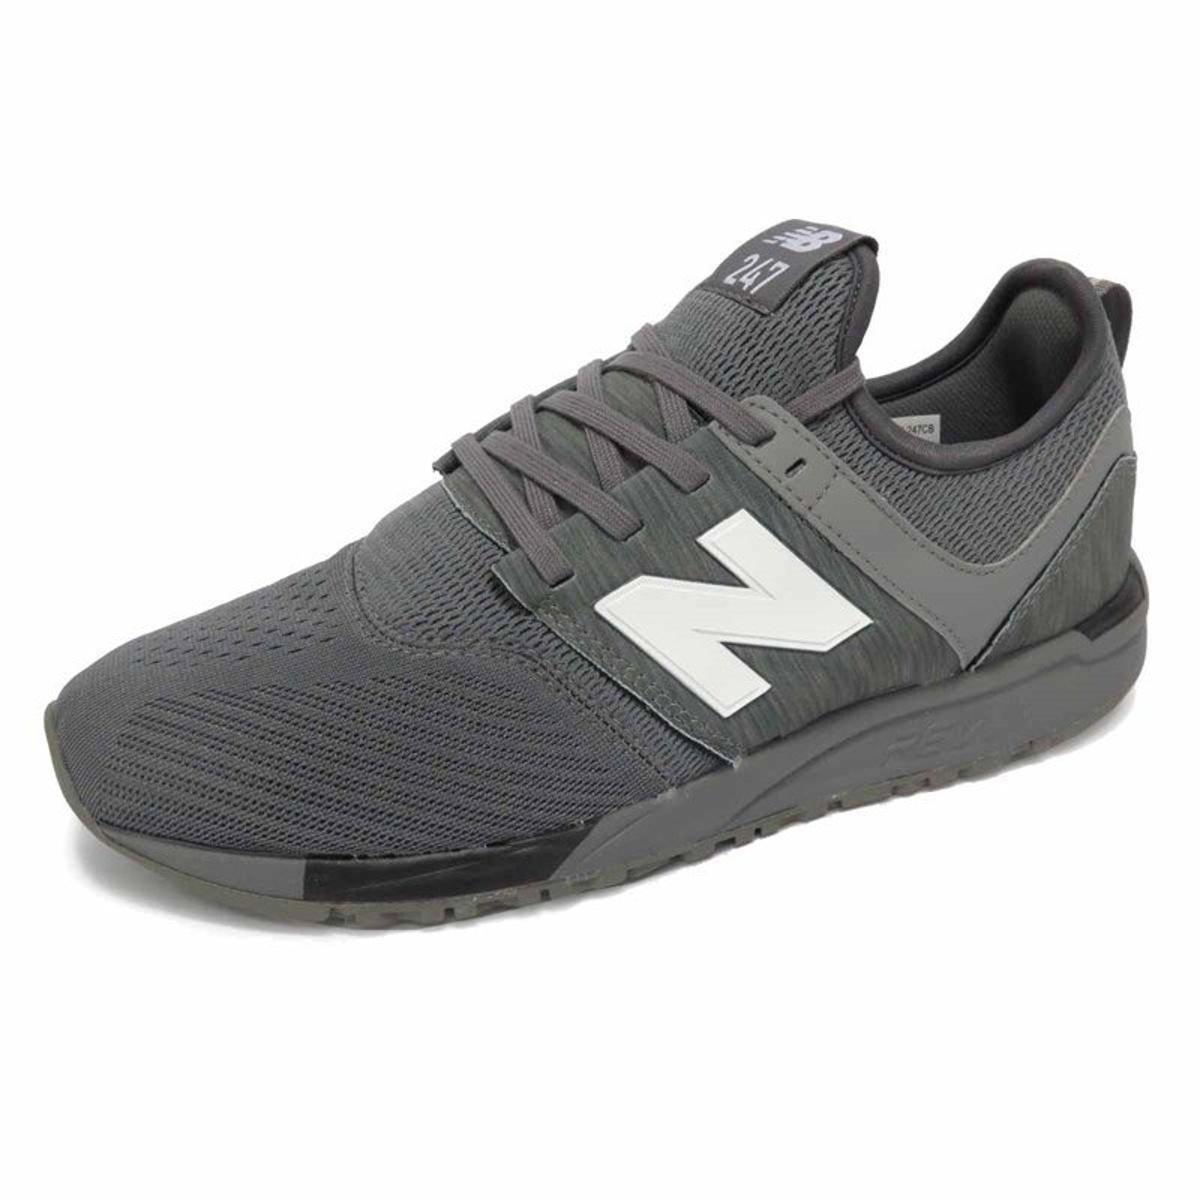 Tênis New Balance 247 Classic Masculino - Compre Agora  8726d798b2c